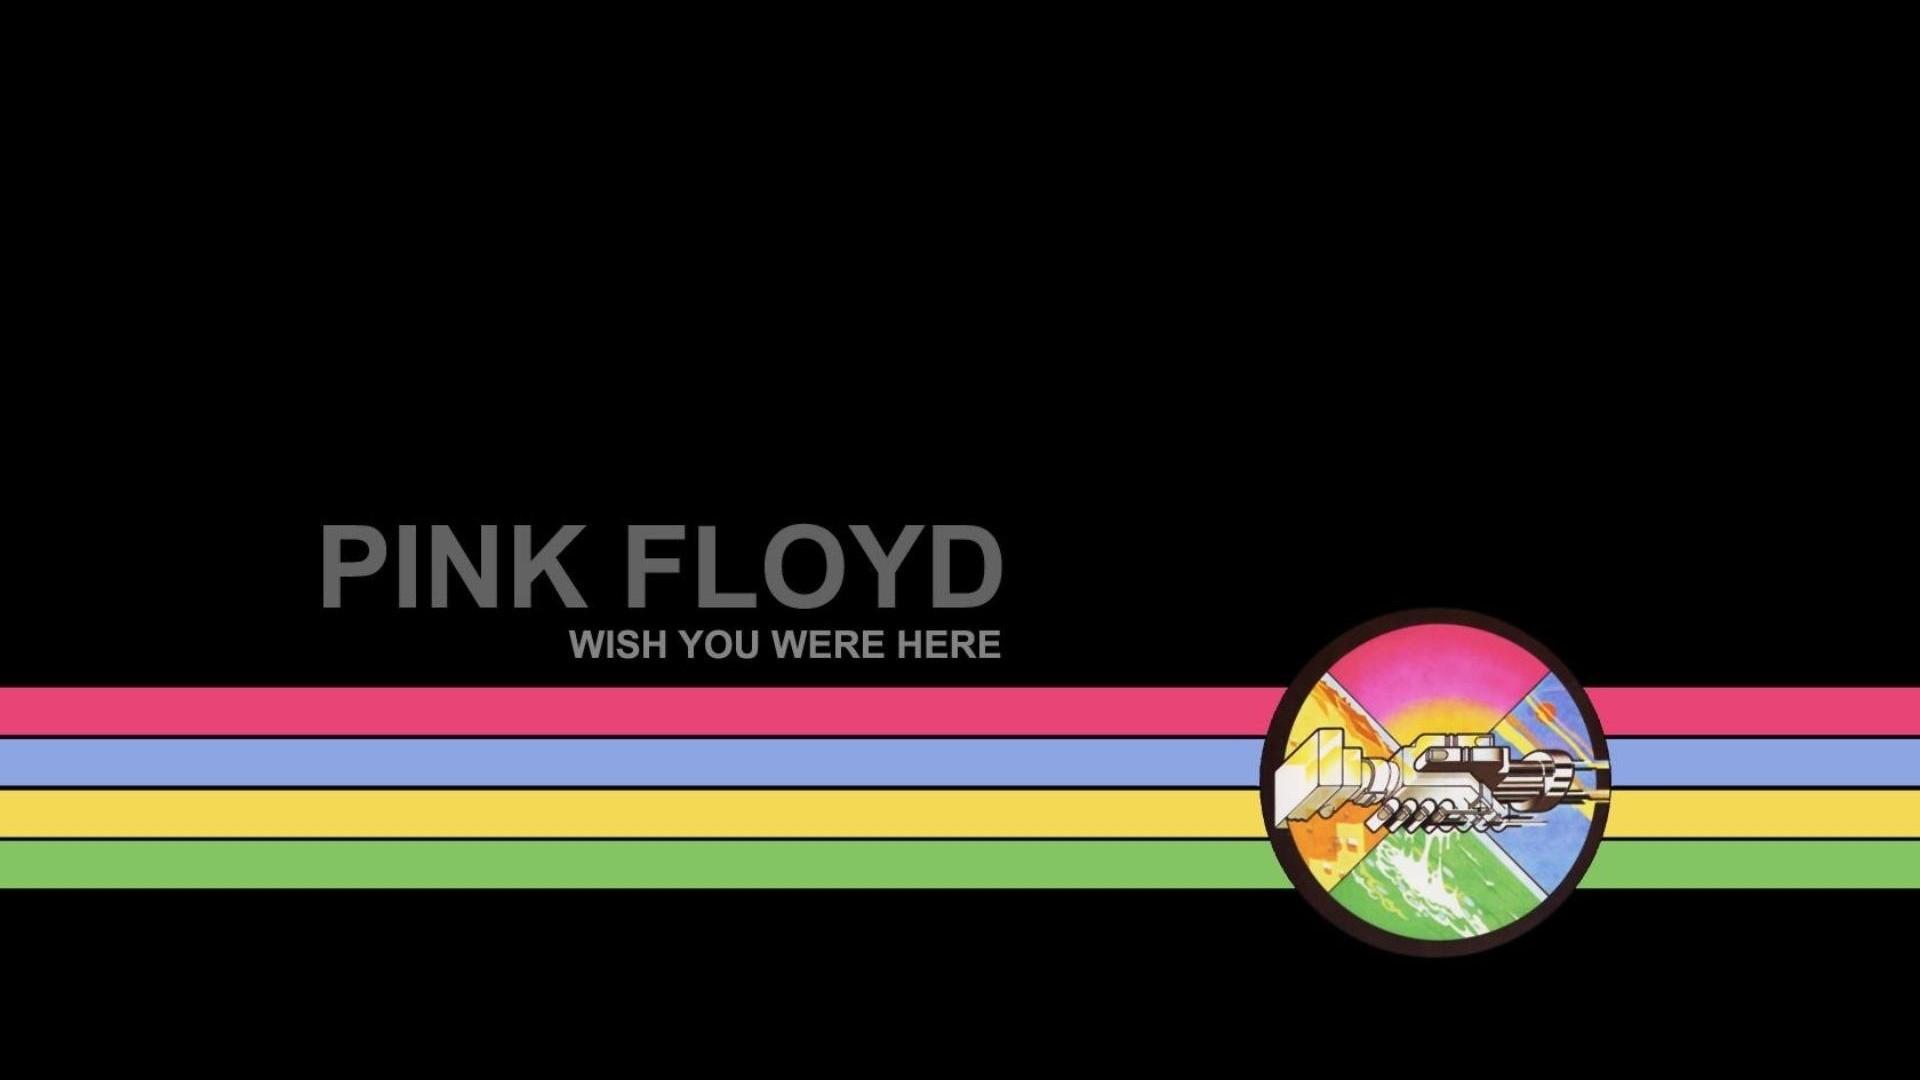 Pink Floyd Wish You Were Here Desktop Full HD Wallpaper …